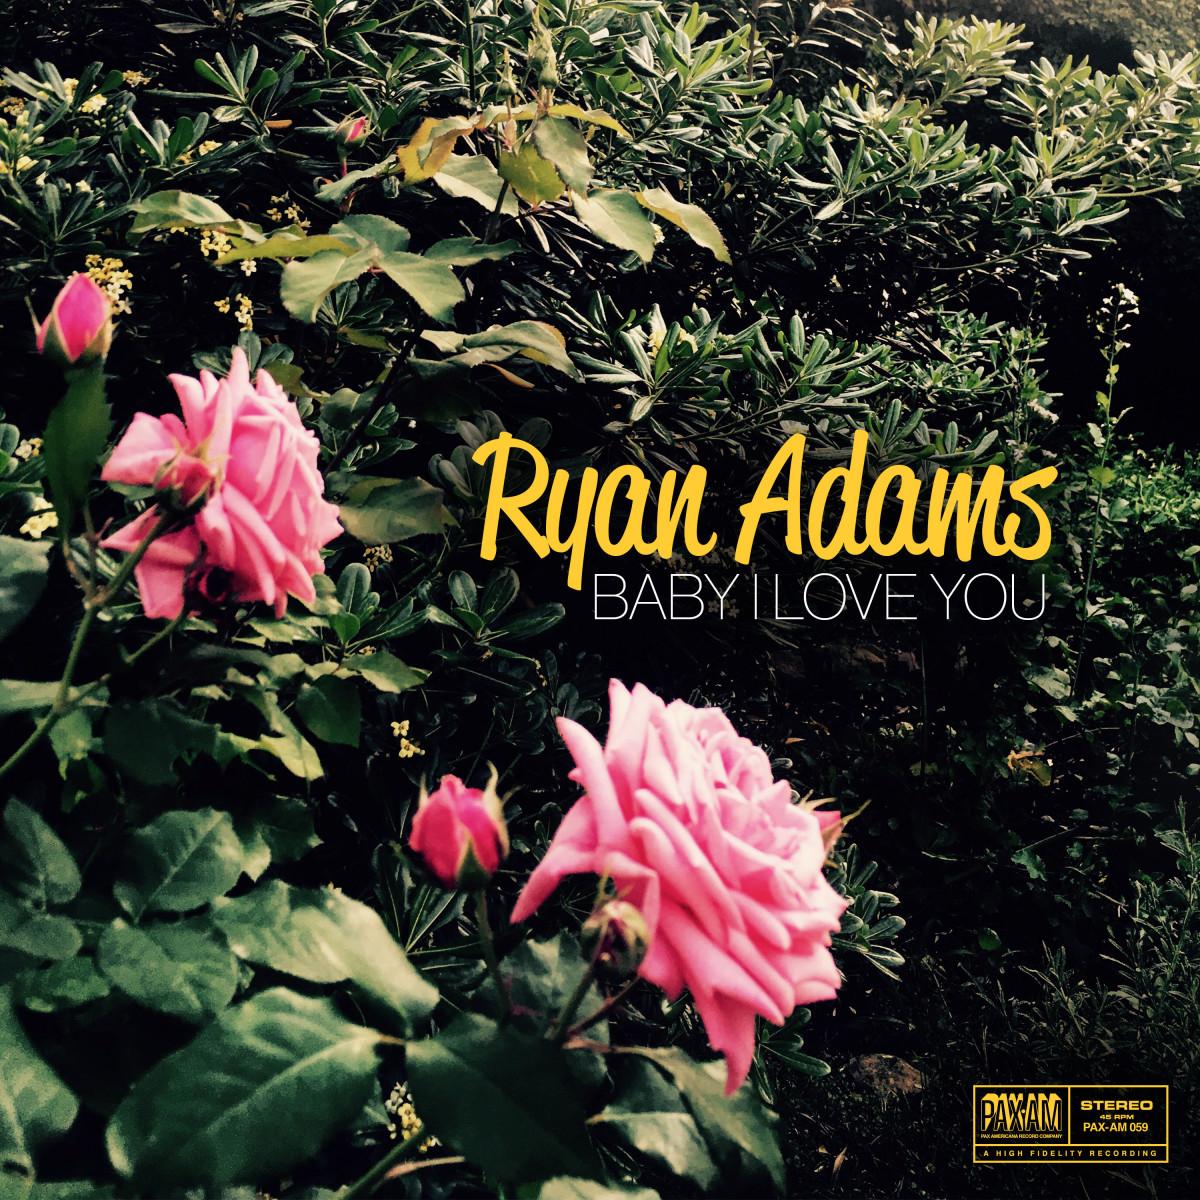 Ryan Adams Baby I Love You single